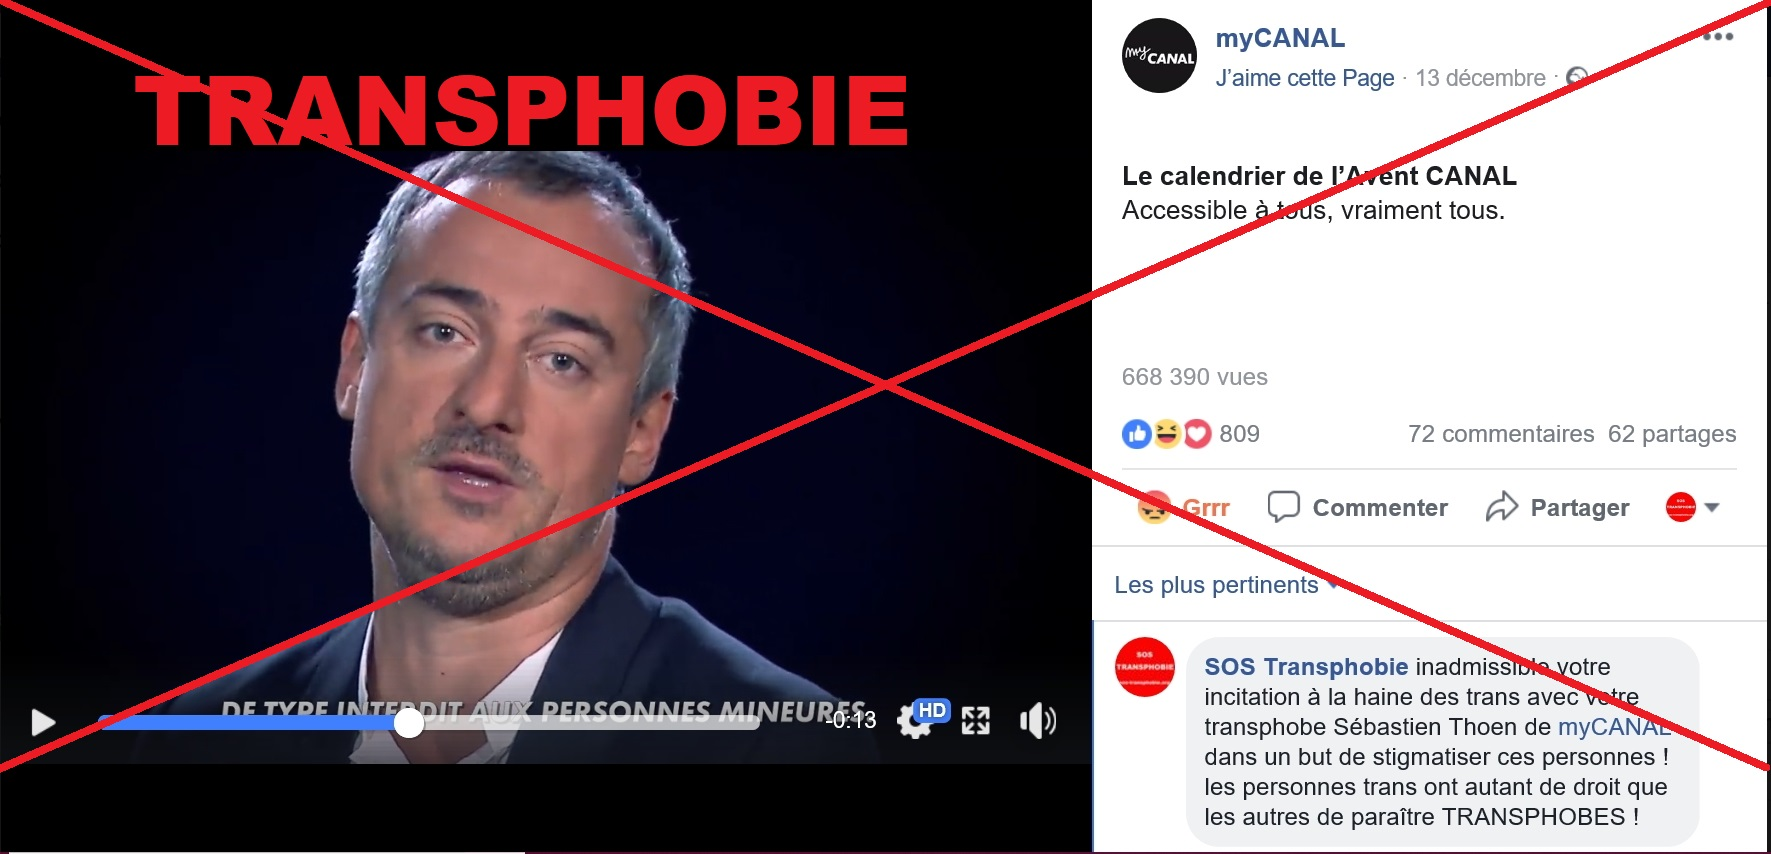 Transphobie de myCanal 13.12.2018.jpg